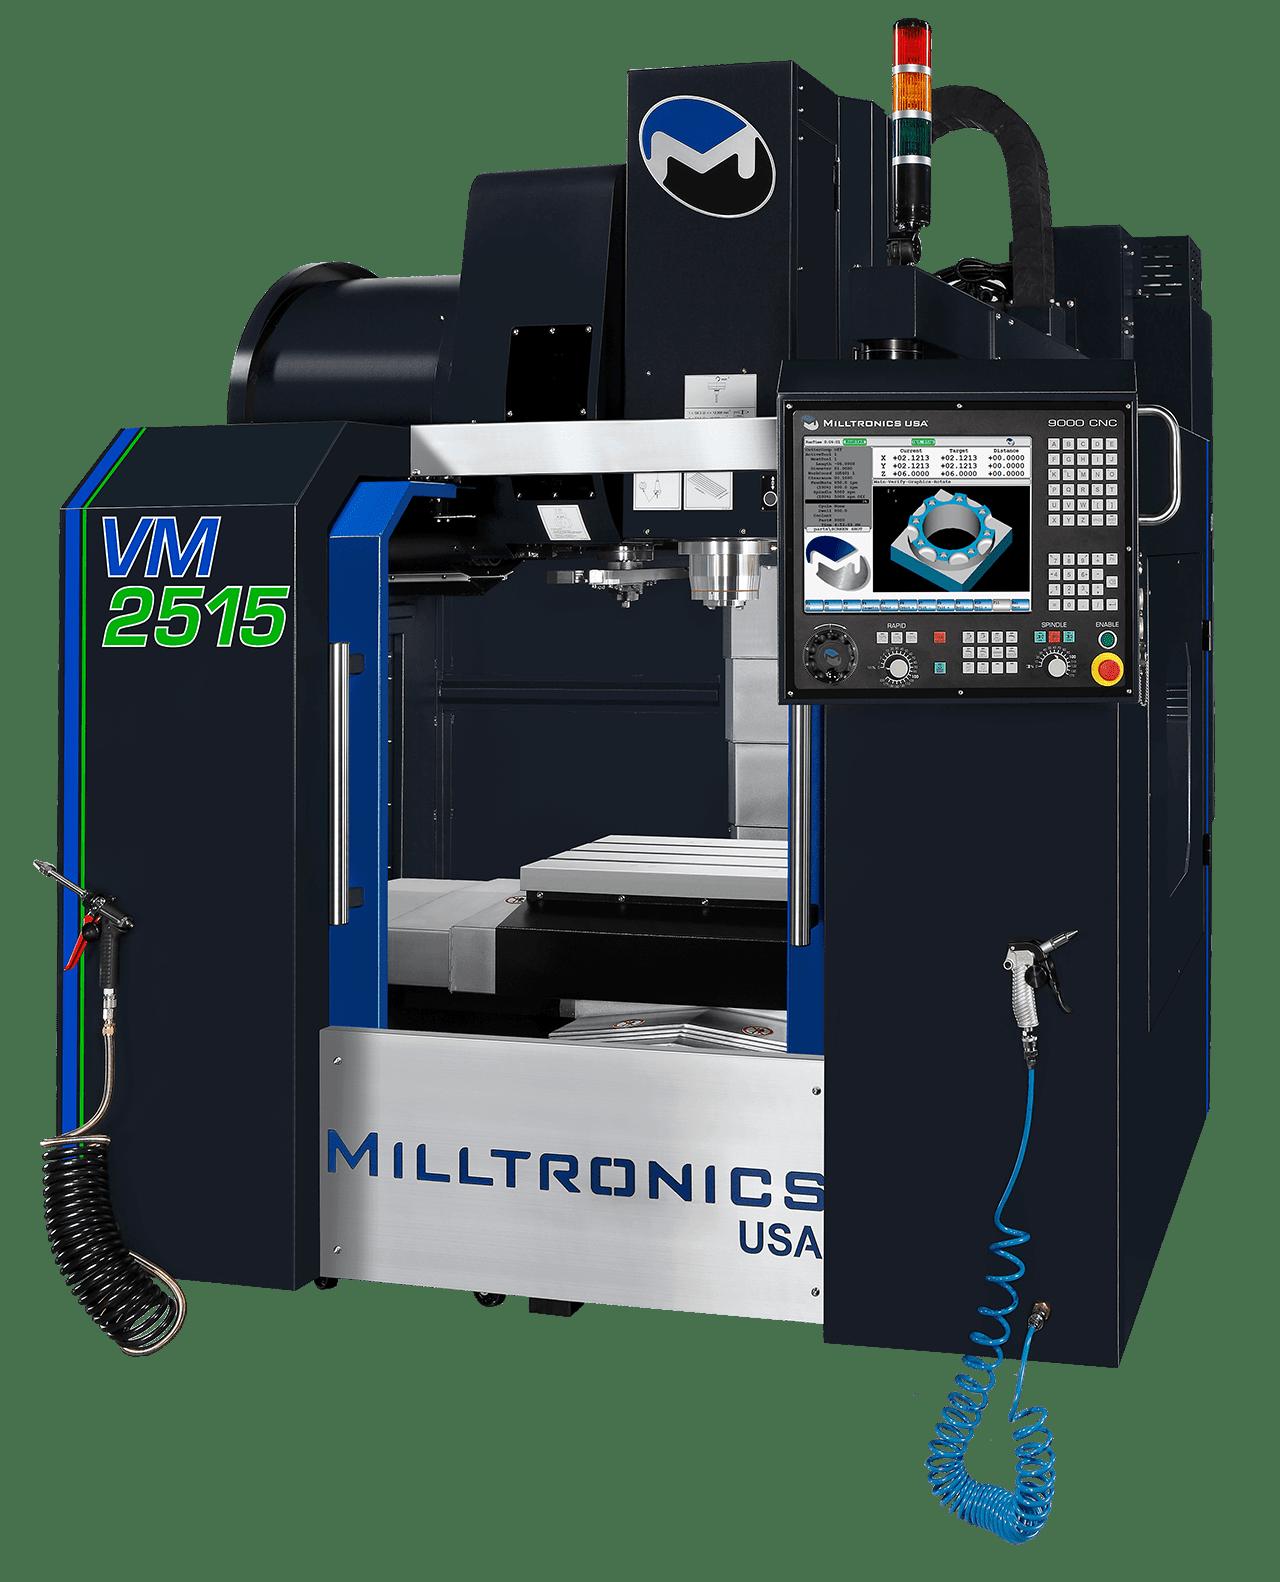 VM2515 Milltronics 3-Axis Mill